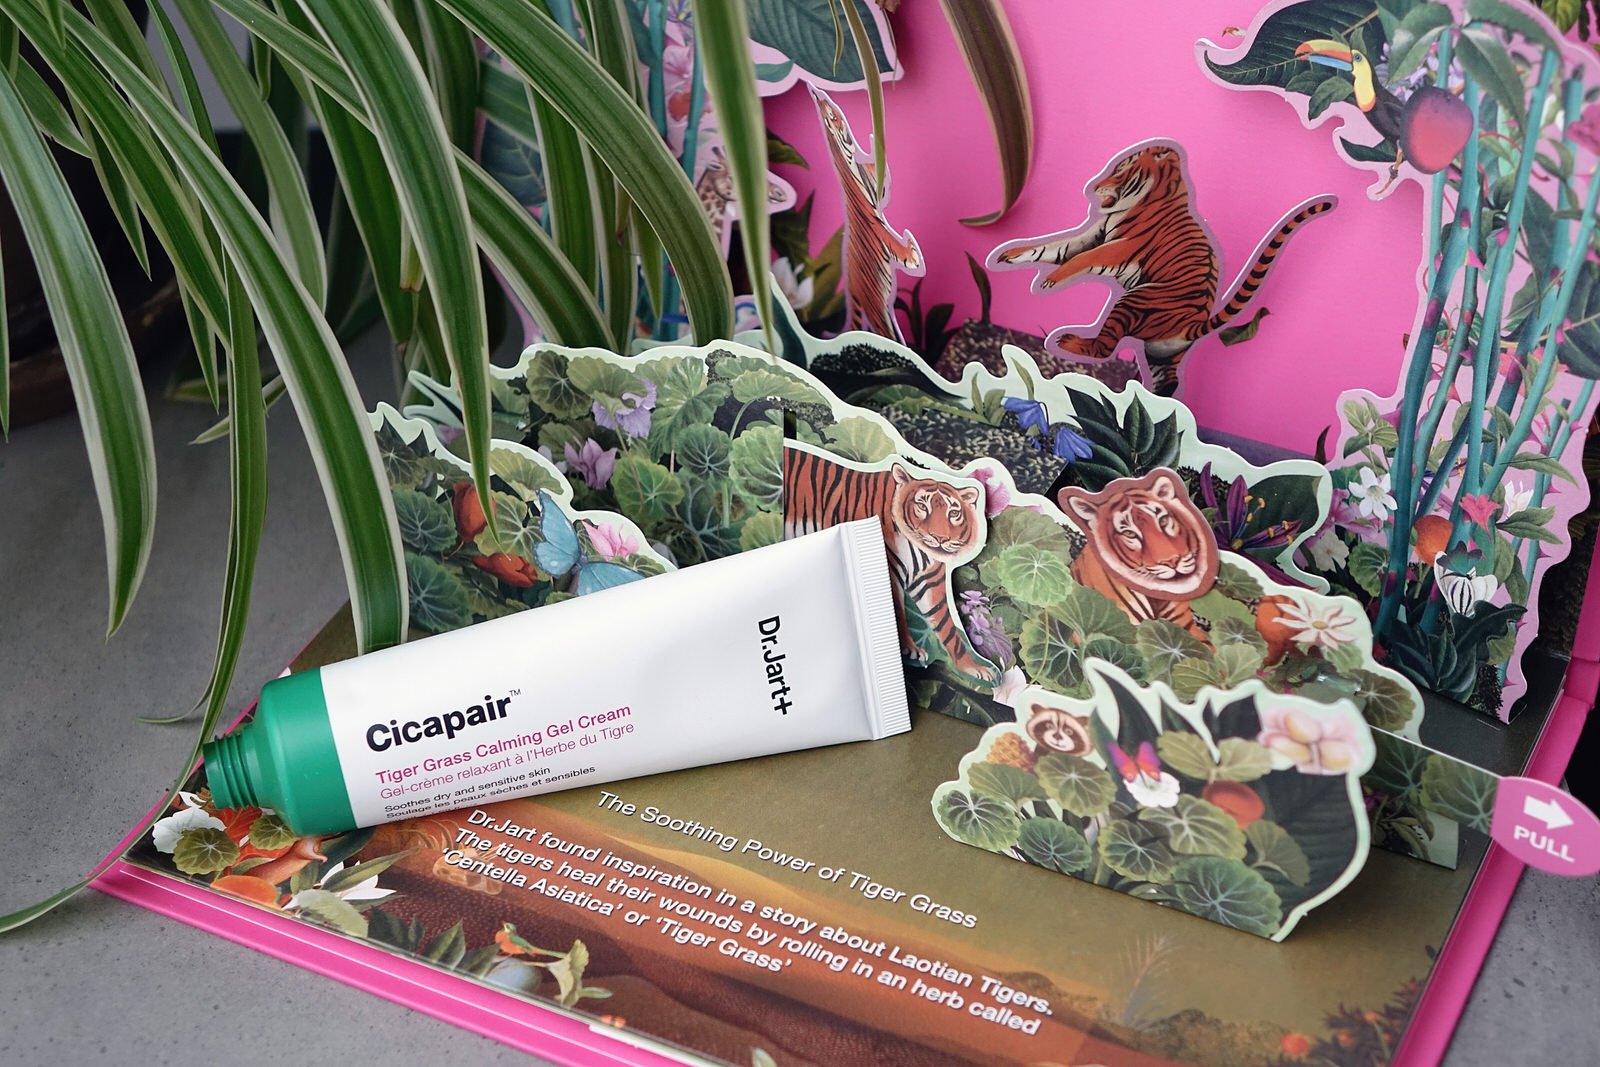 La gamme Cicapair du Dr Jart + Tiger Grass, test et avis